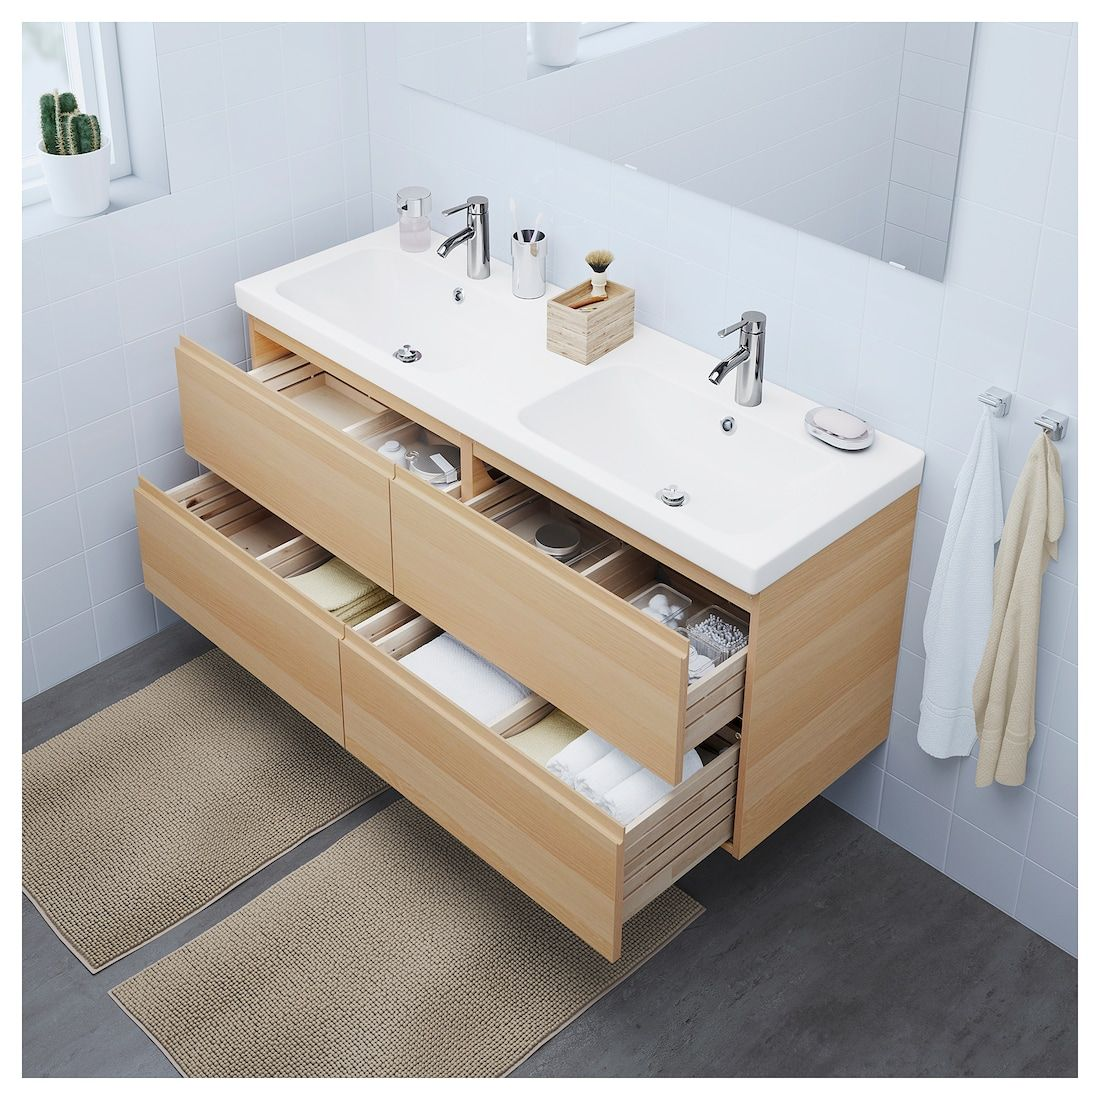 Ikea Godmorgon Odensvik White Stained Oak Effect Dalskar Faucet Sink Cabinet With 4 Drawers En 2020 Meuble Lavabo Lavabo Ikea Et Lavabo